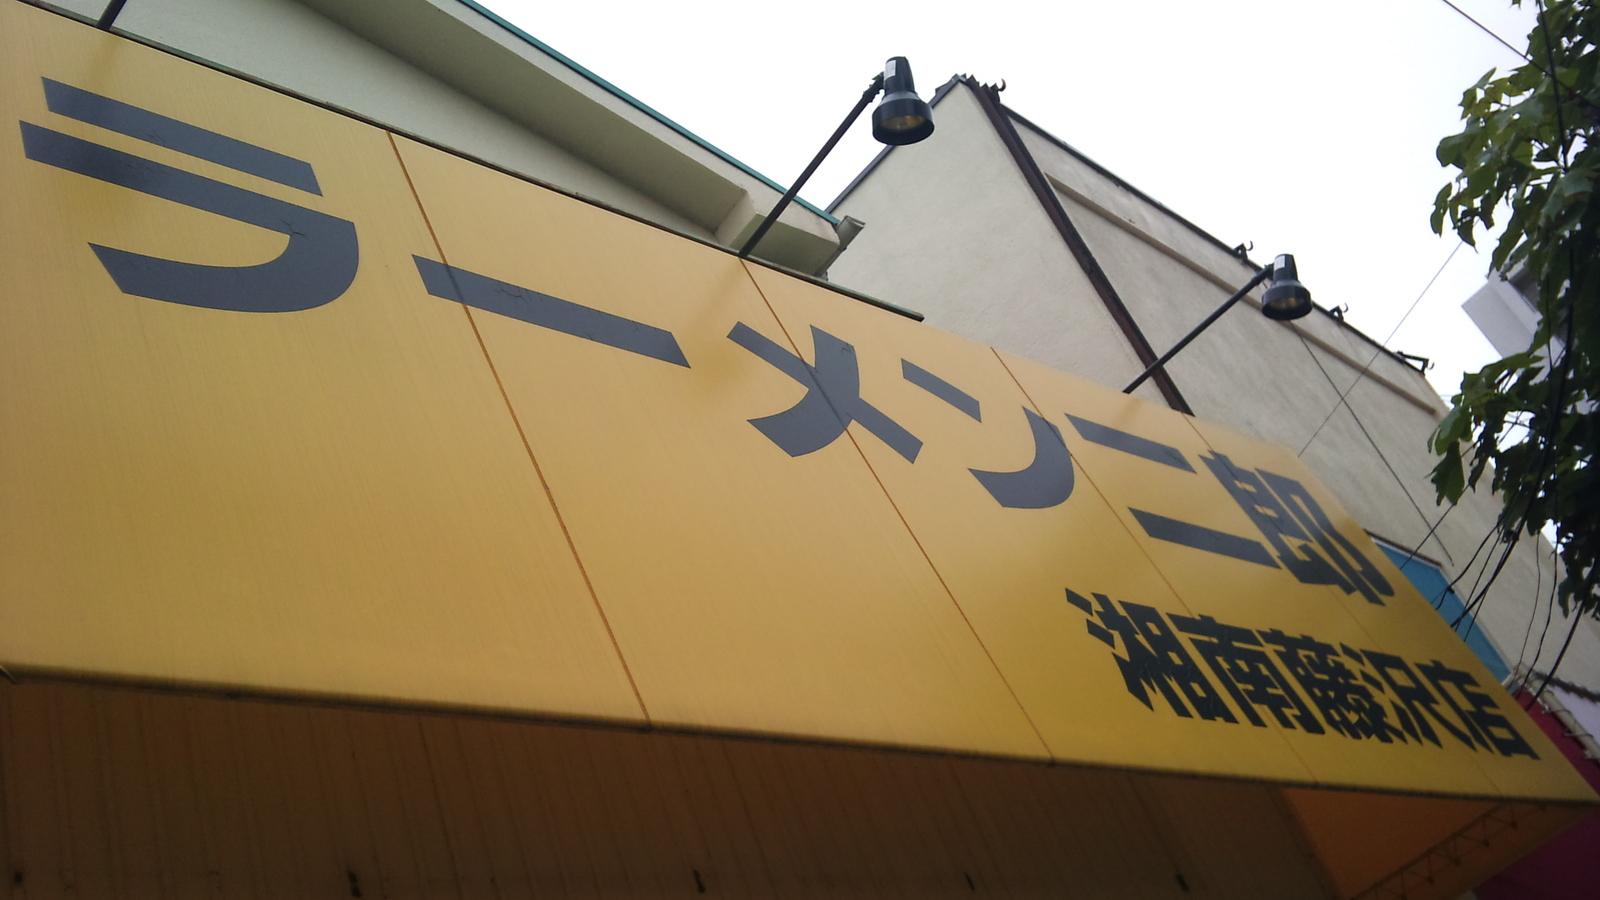 20110618_112100